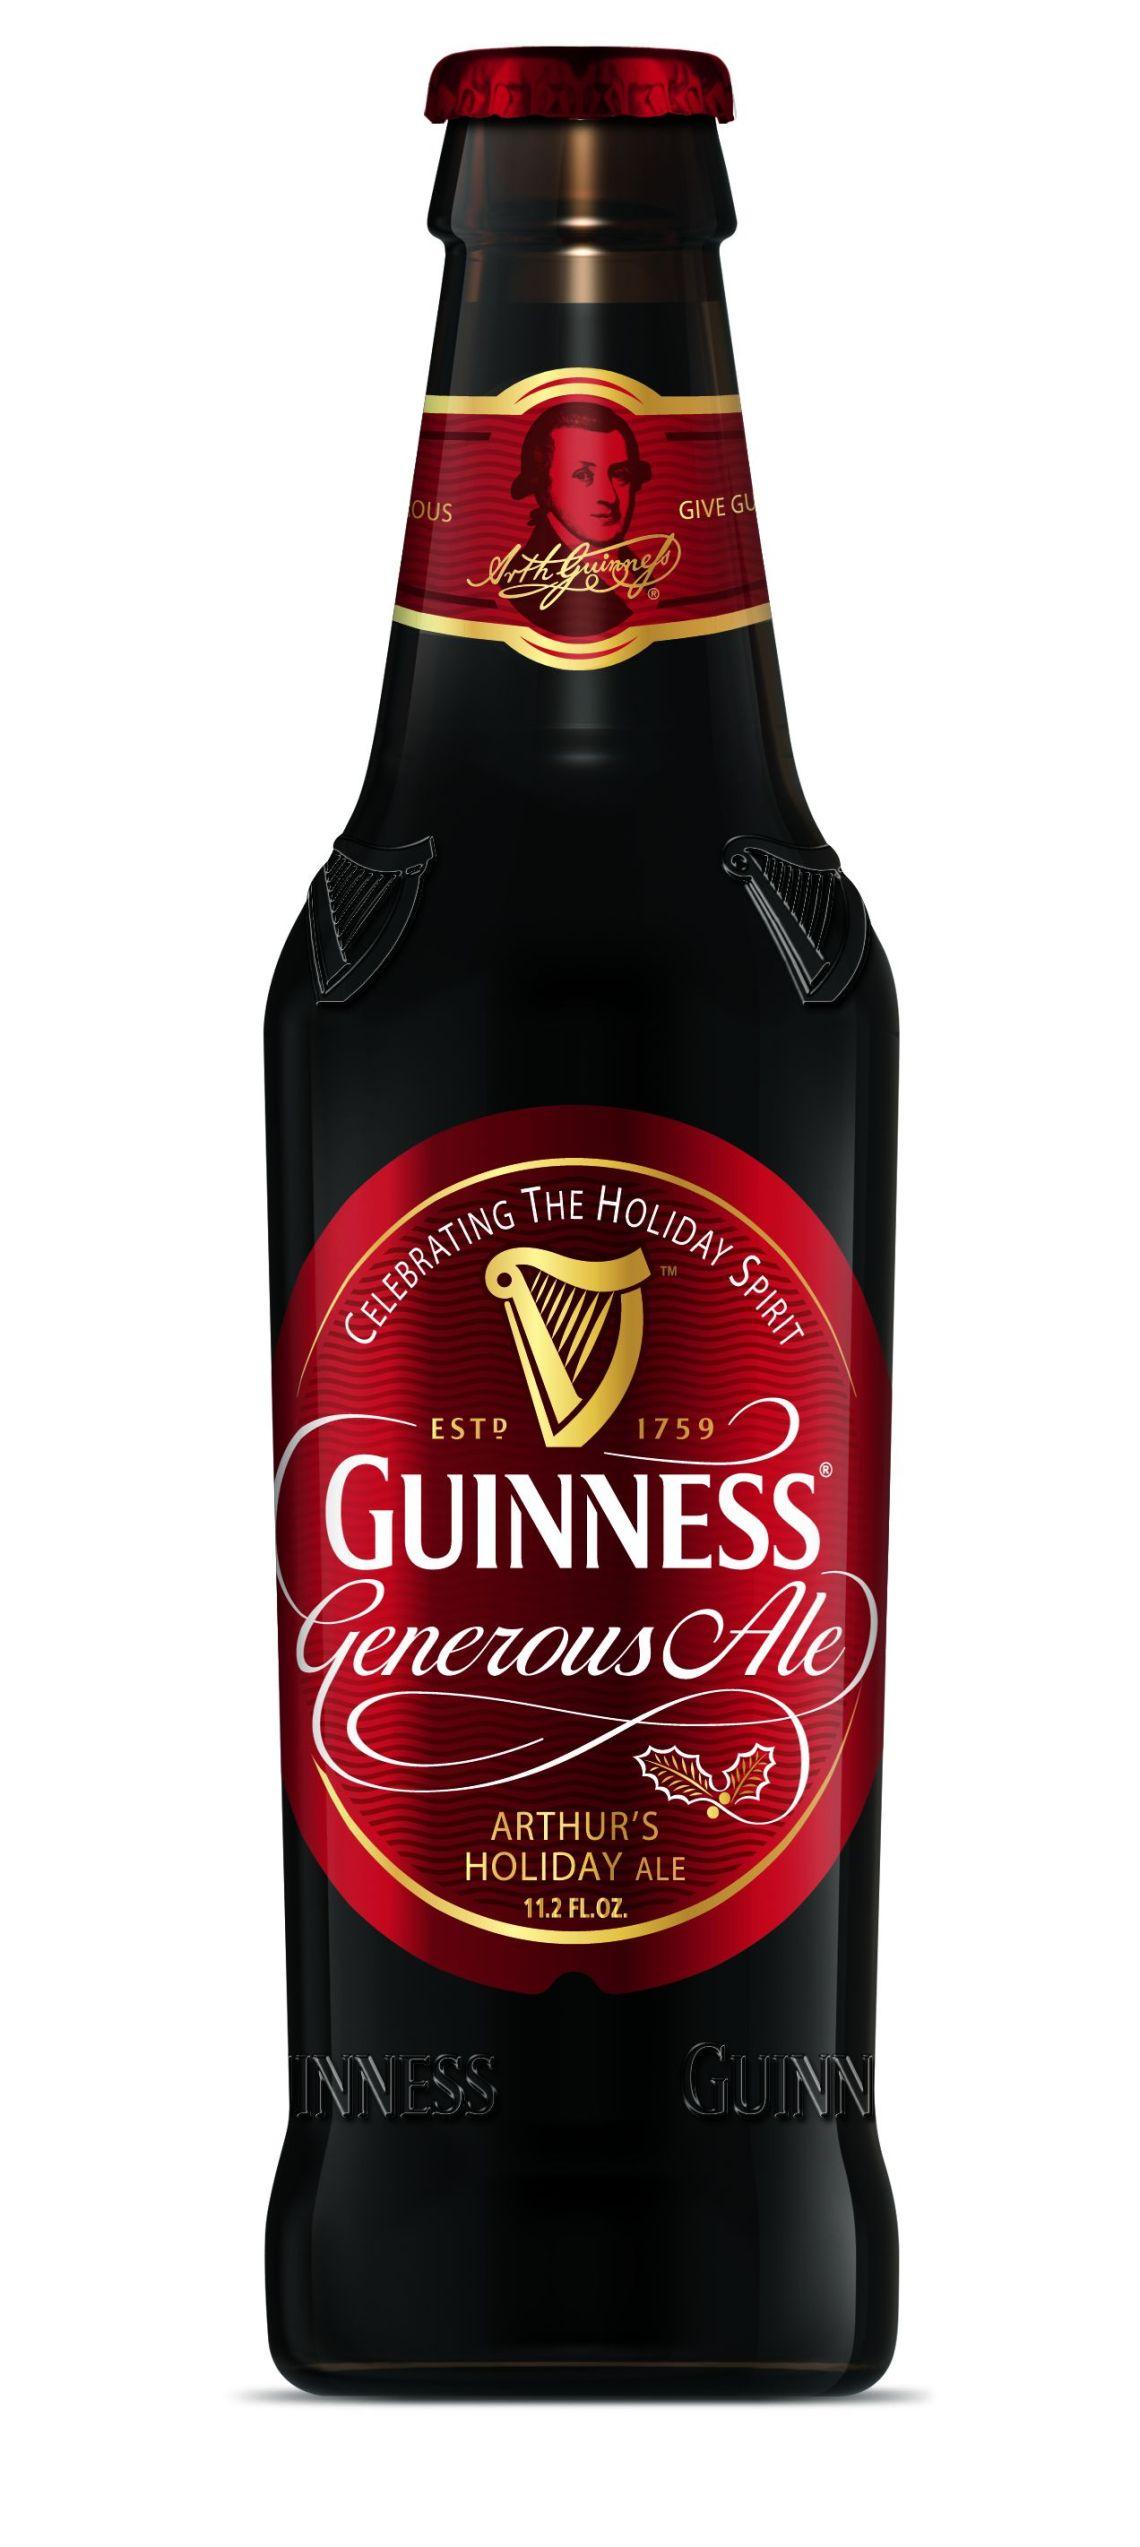 Guinness Generous Ale